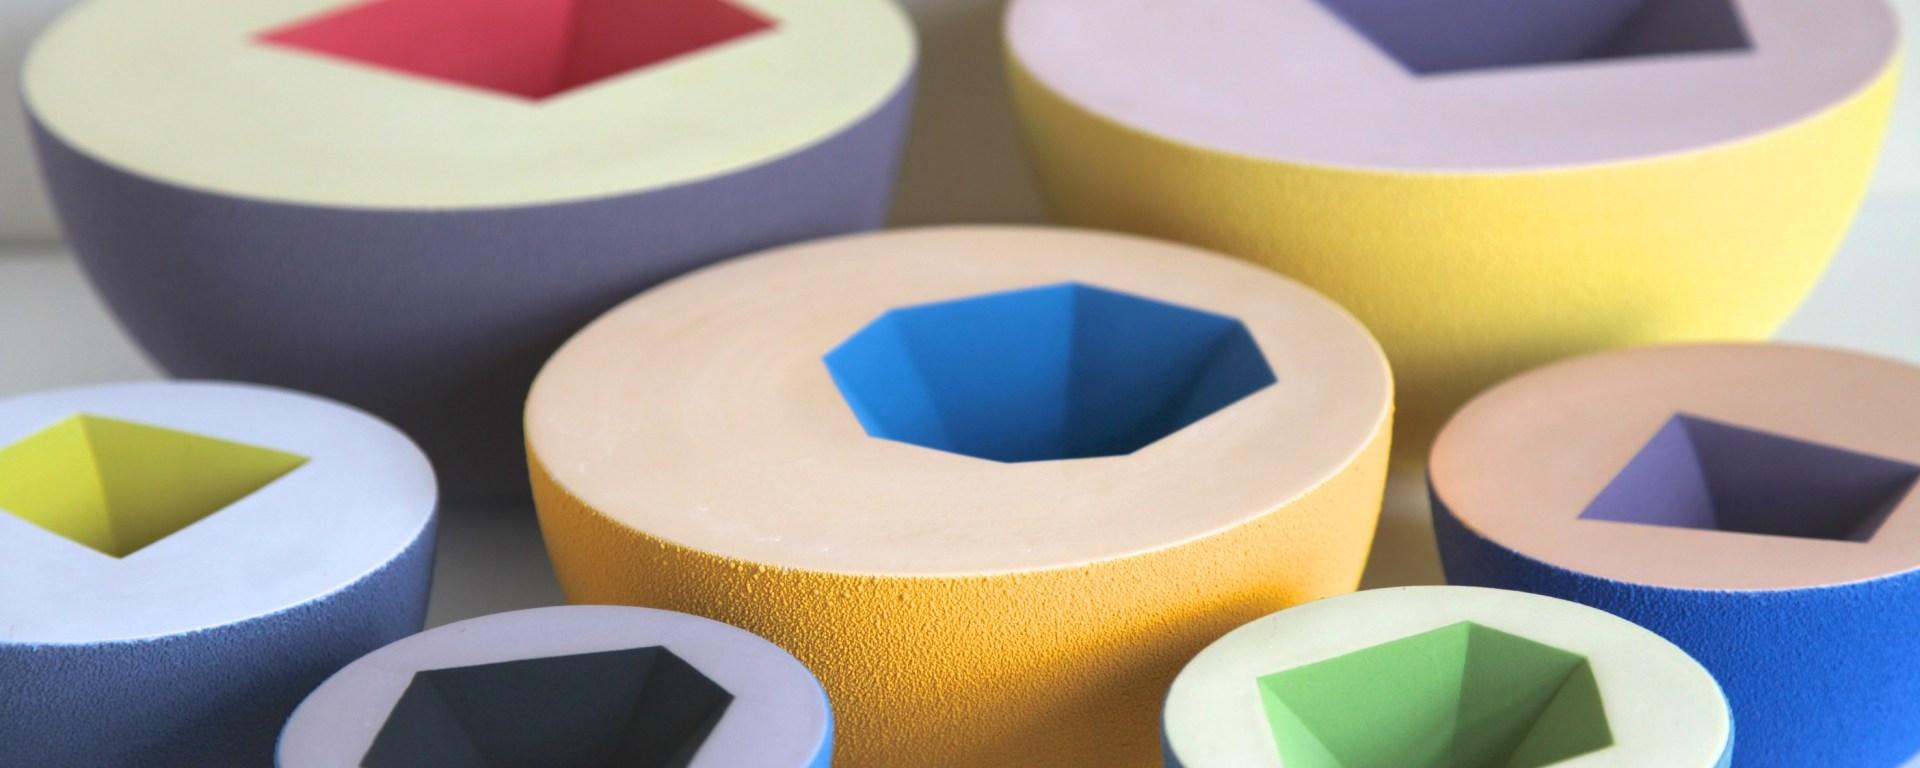 Sophie Southgate's geometric ceramic vessels